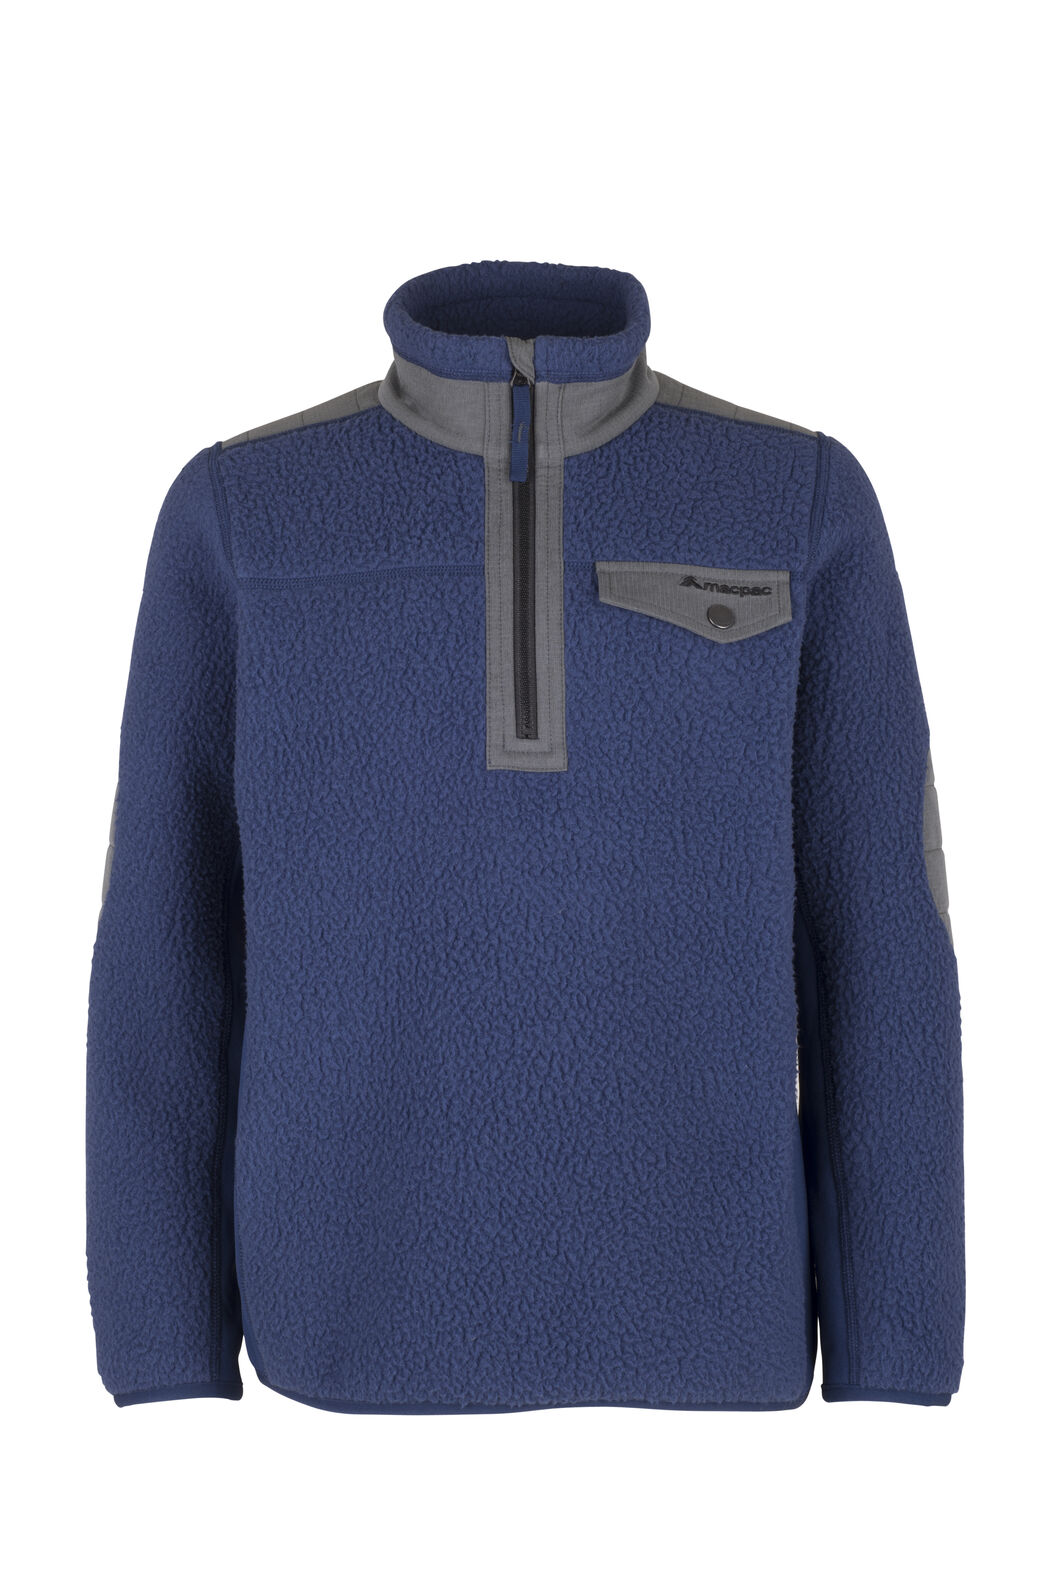 Macpac Campfire Fleece Pullover - Kids', Medieval Blue, hi-res